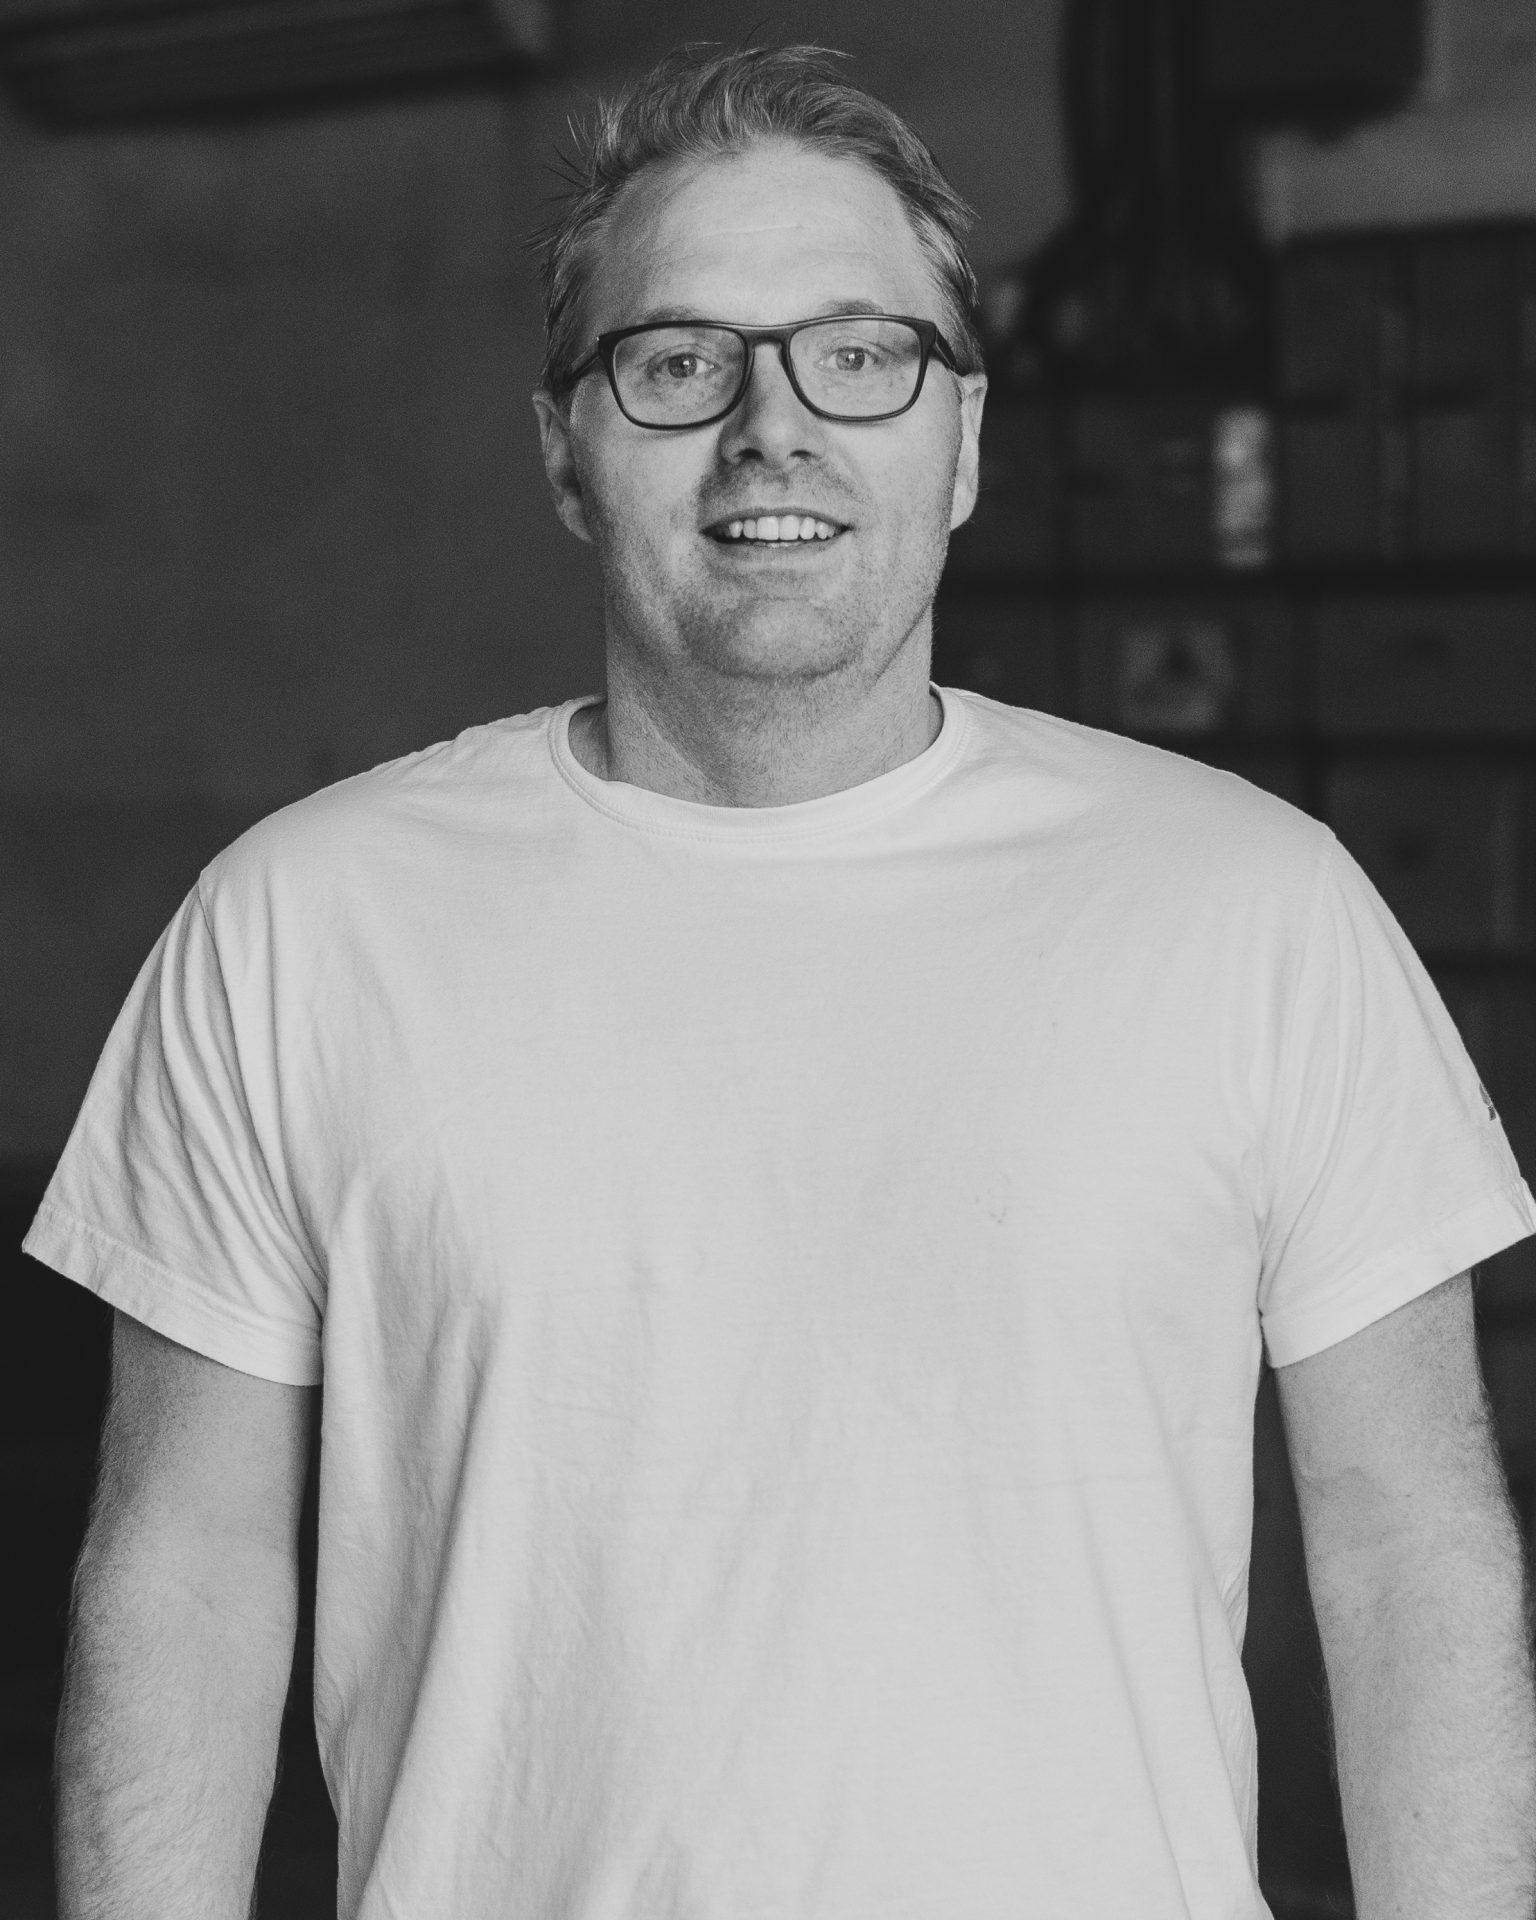 Anders Westerberg Avdelningschef Sanitet & Värme IVAB Piteå